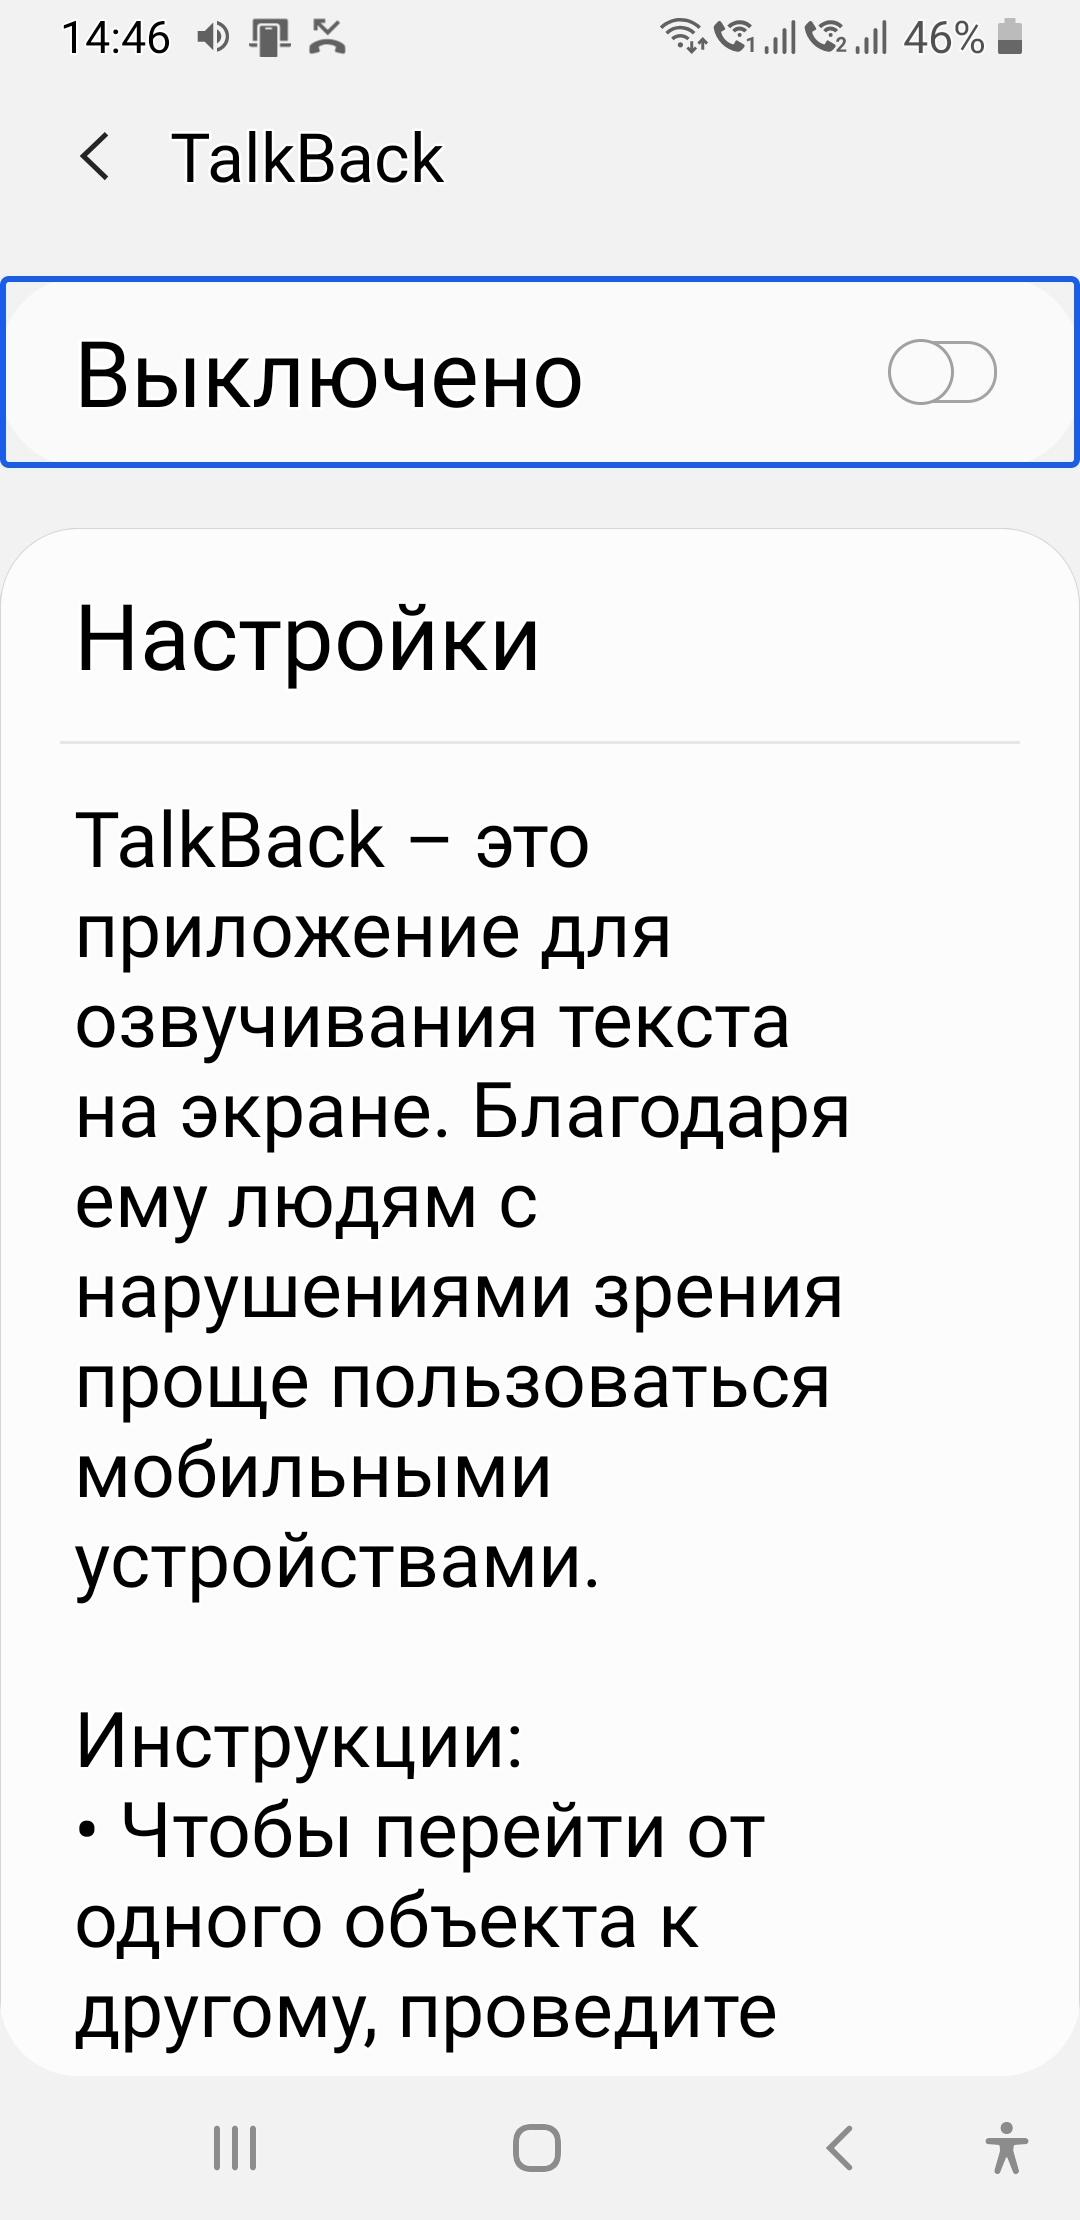 говорит кто_TalkBack